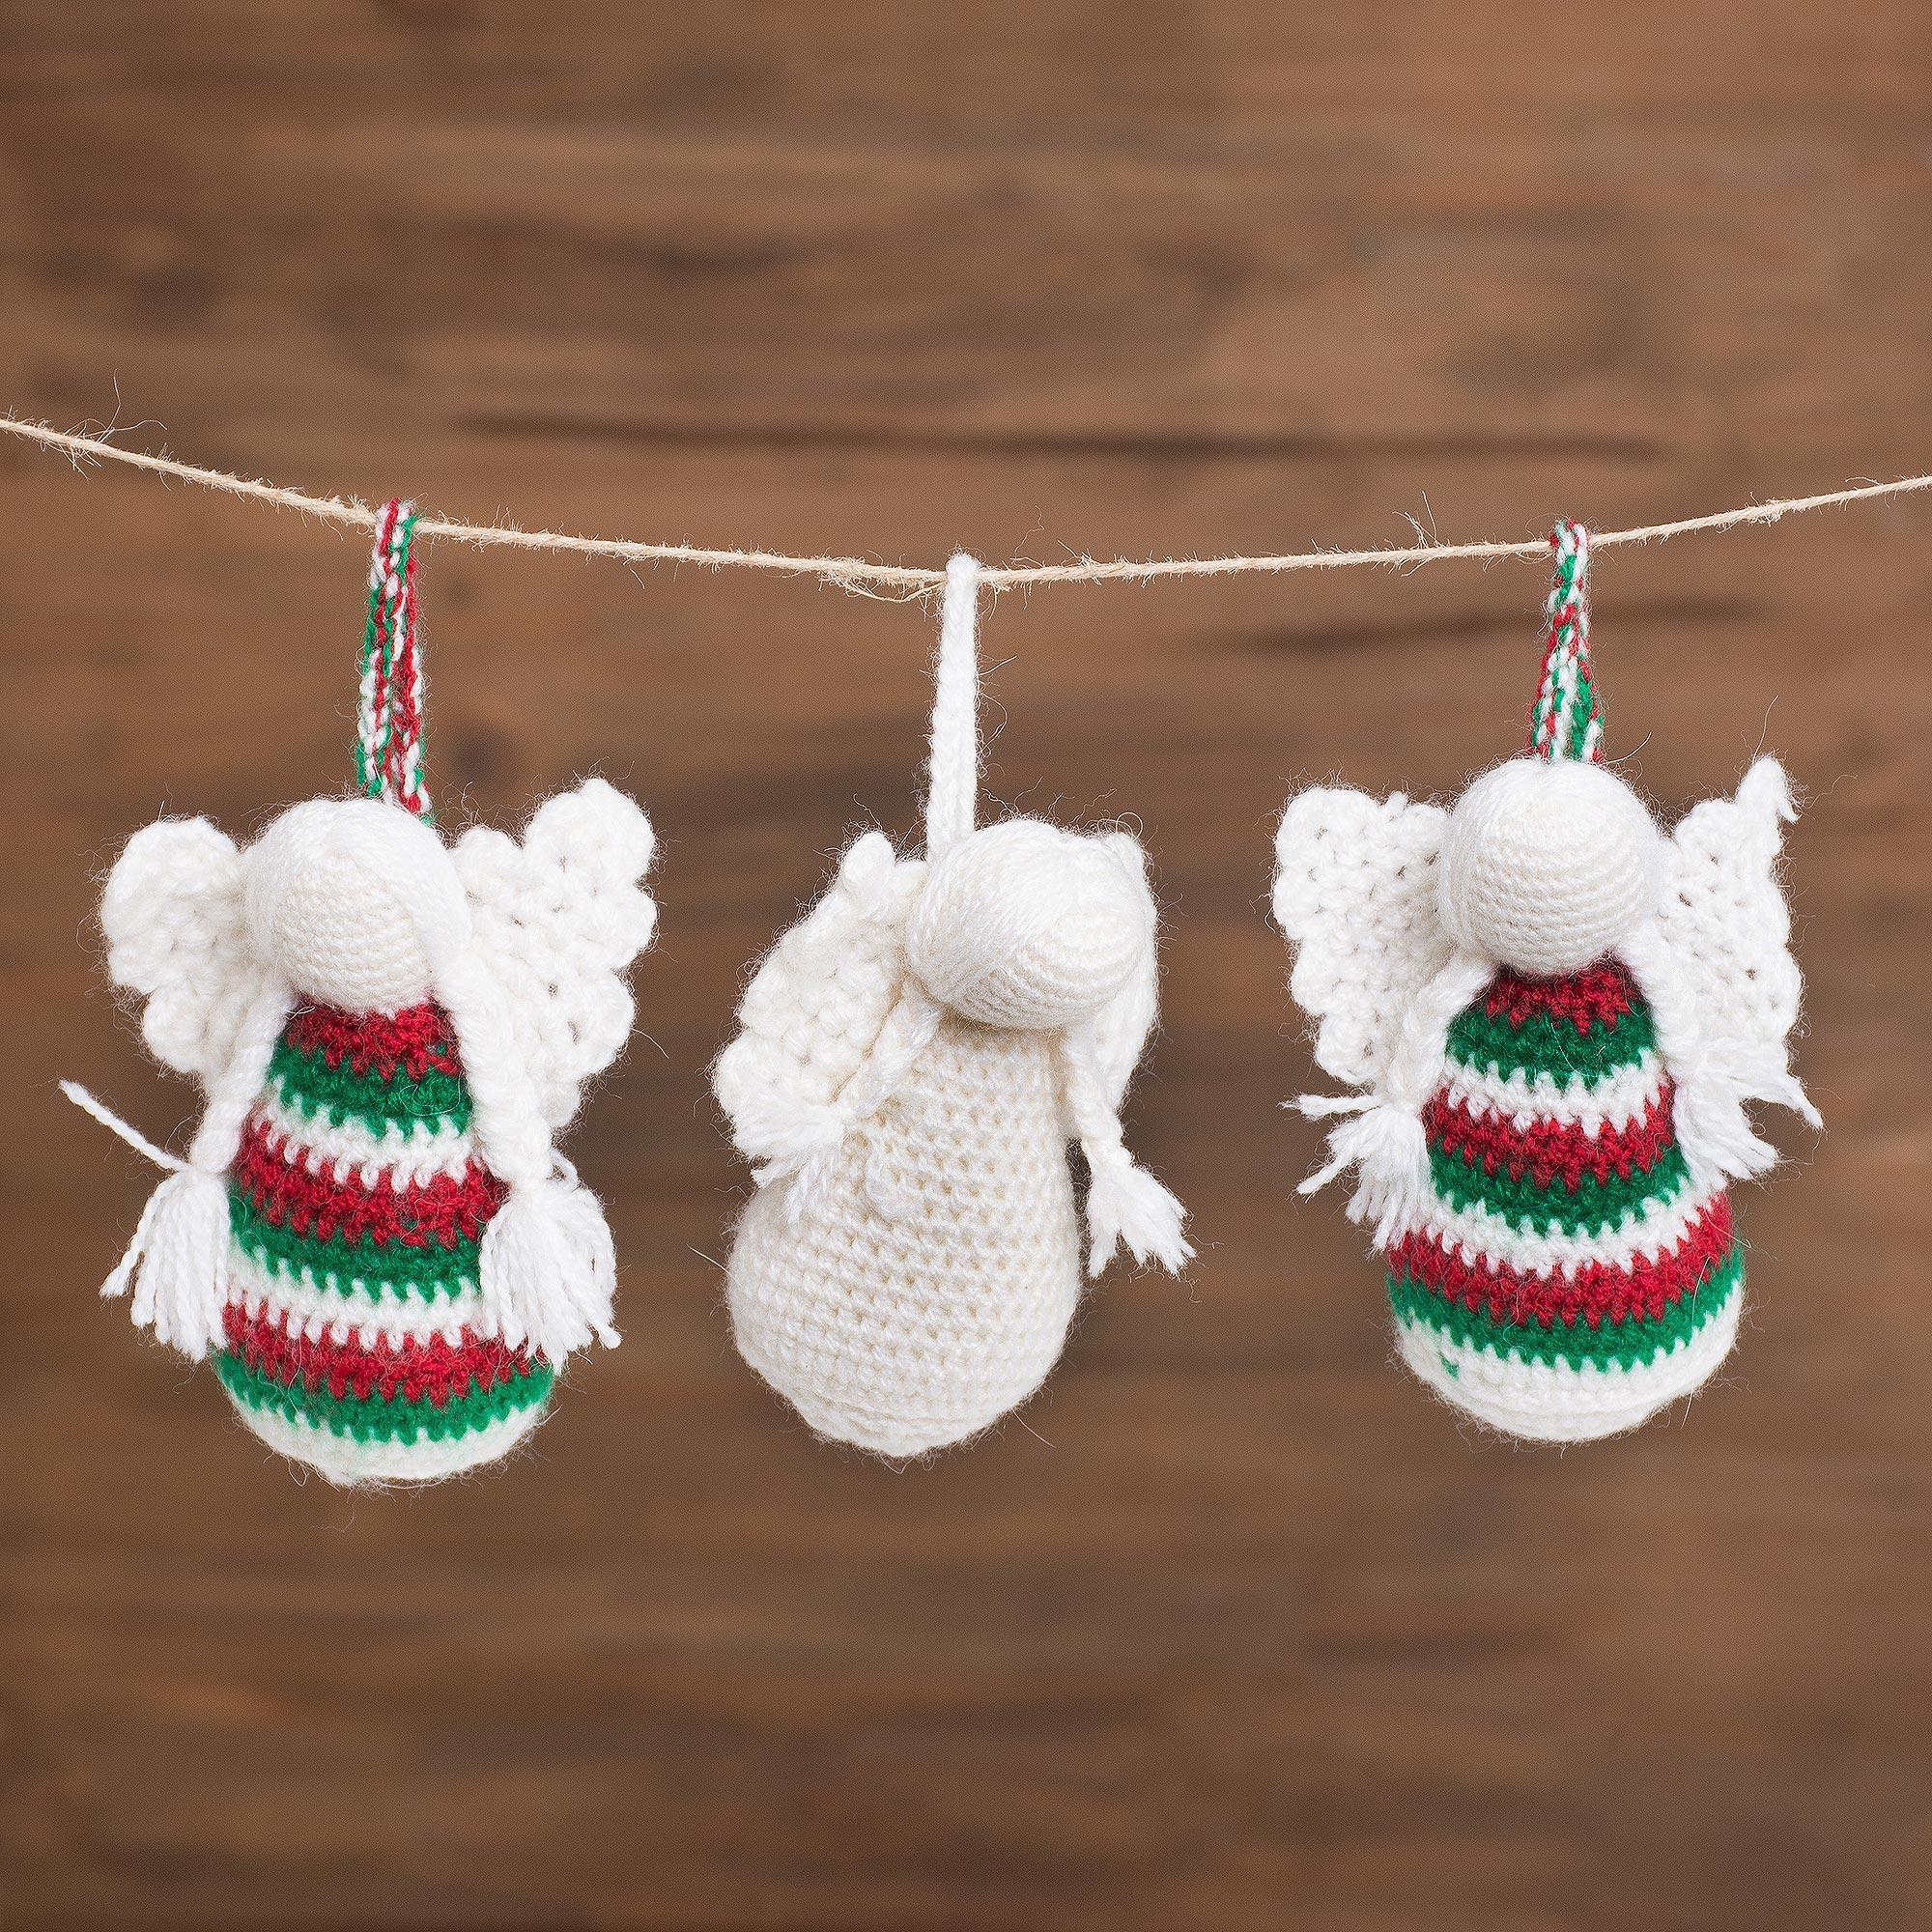 Crocheted Angel Ornaments From Peru Set Of 3 Sweet Festivity